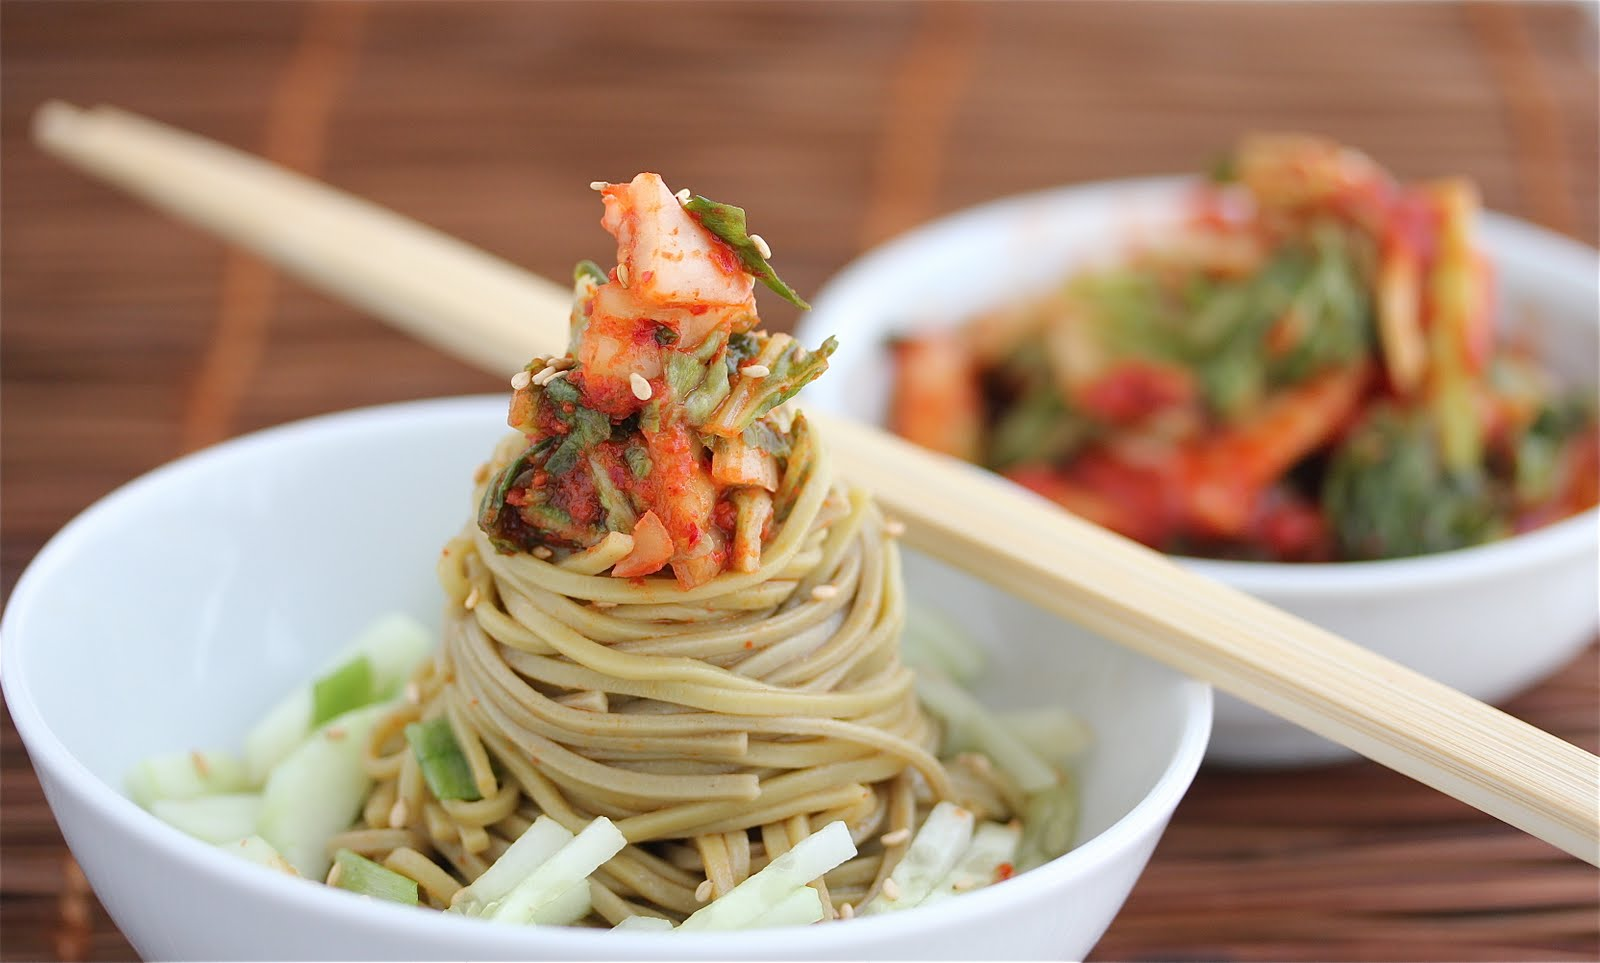 Cold Kim Chi Cucumber Soba Noodle Salad